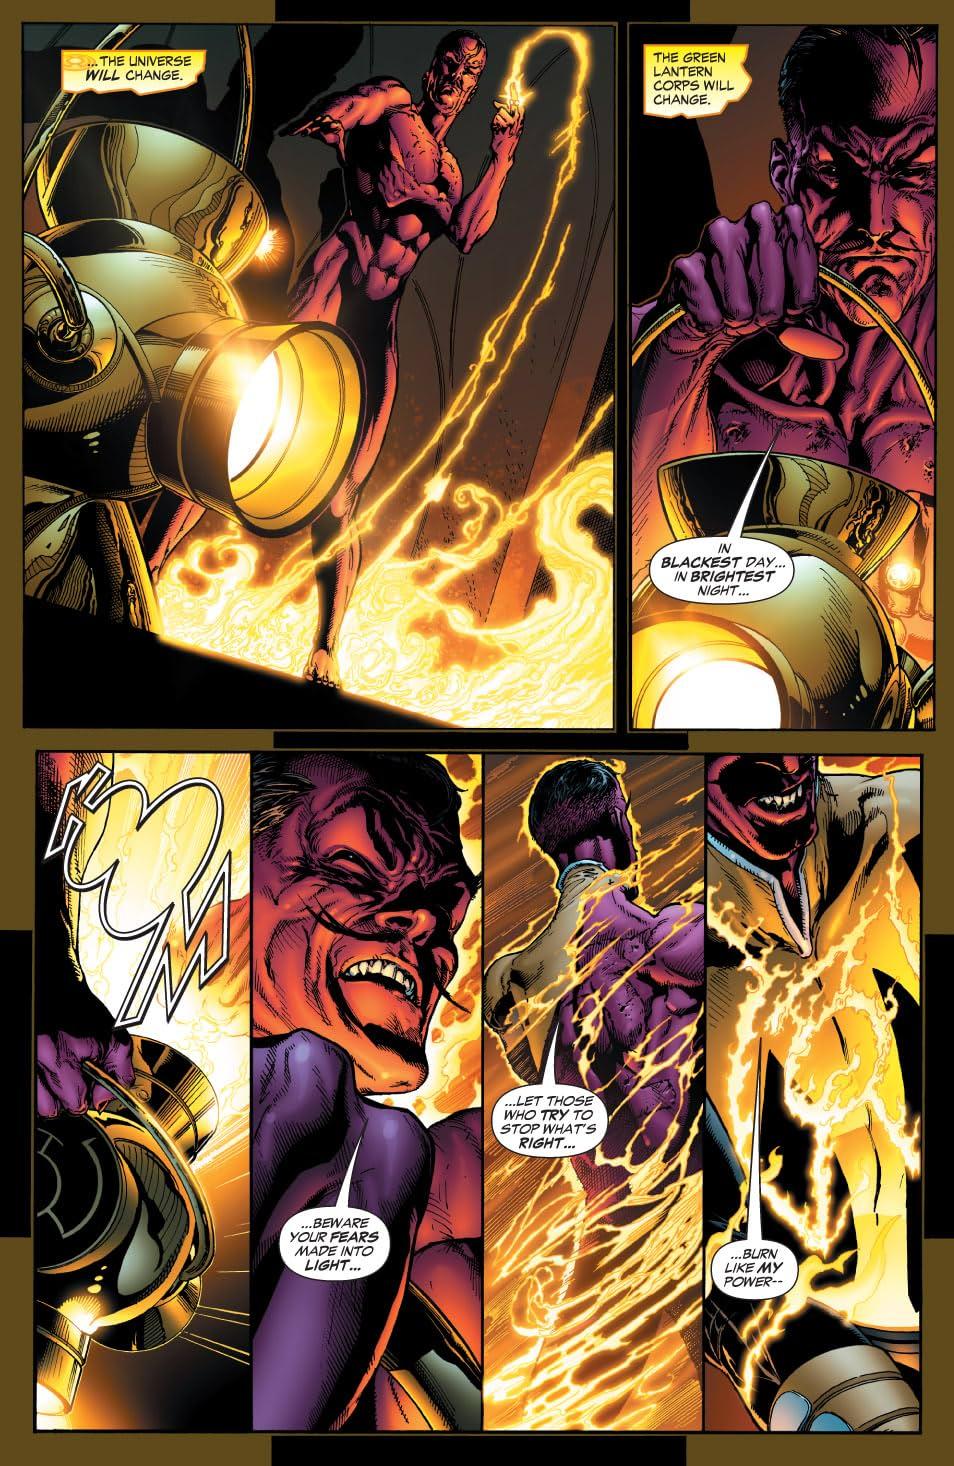 Green Lantern: Sinestro Corps Special #1